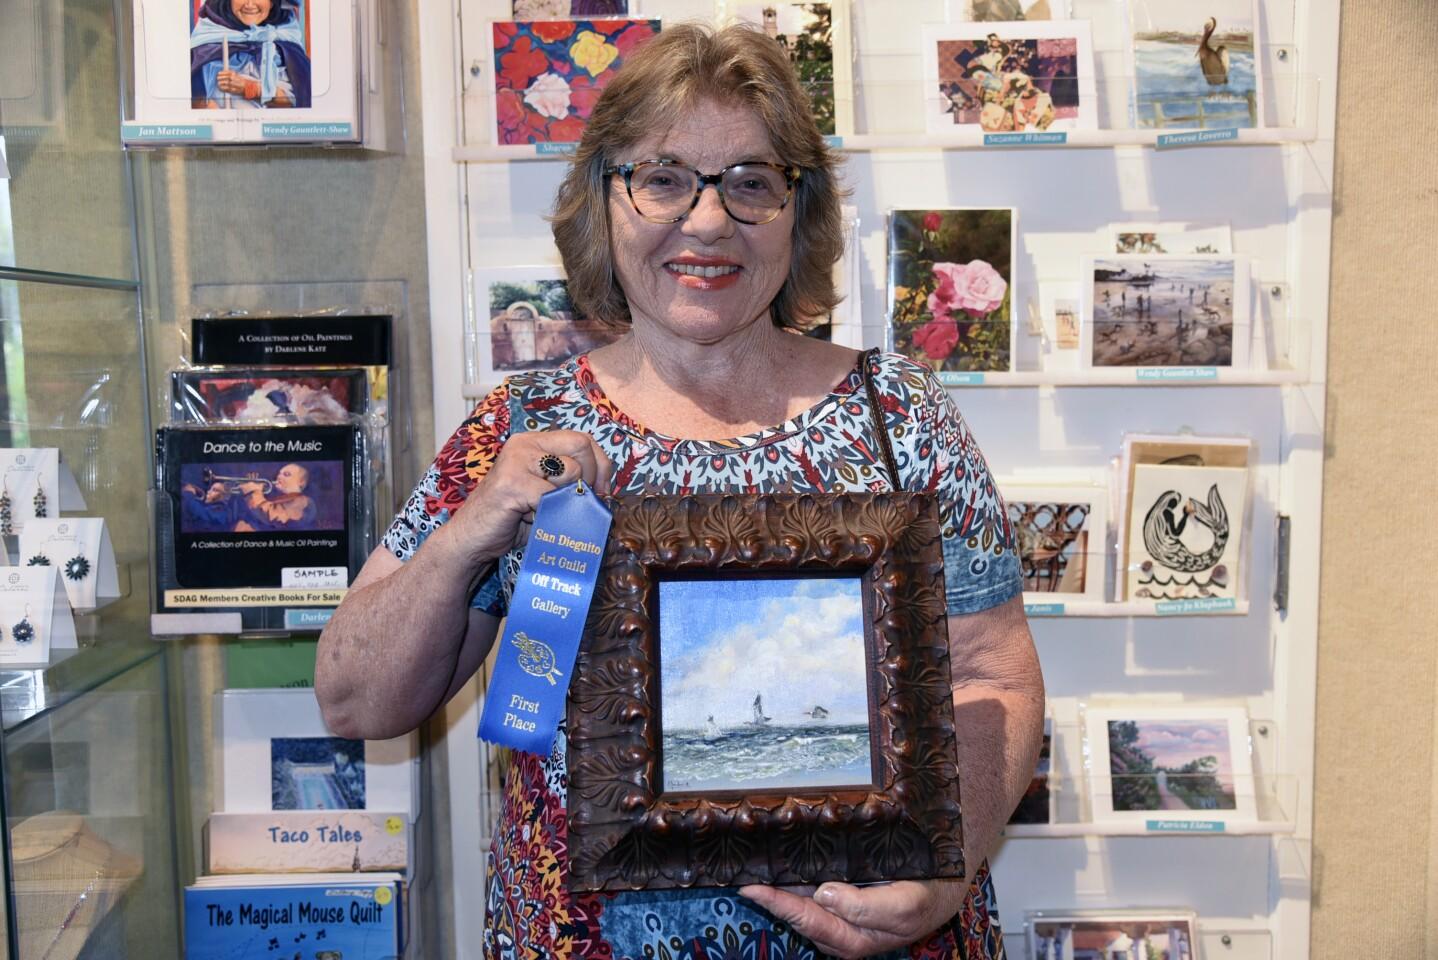 First place Oil 'Early Flight', artist Gloria Chadwick